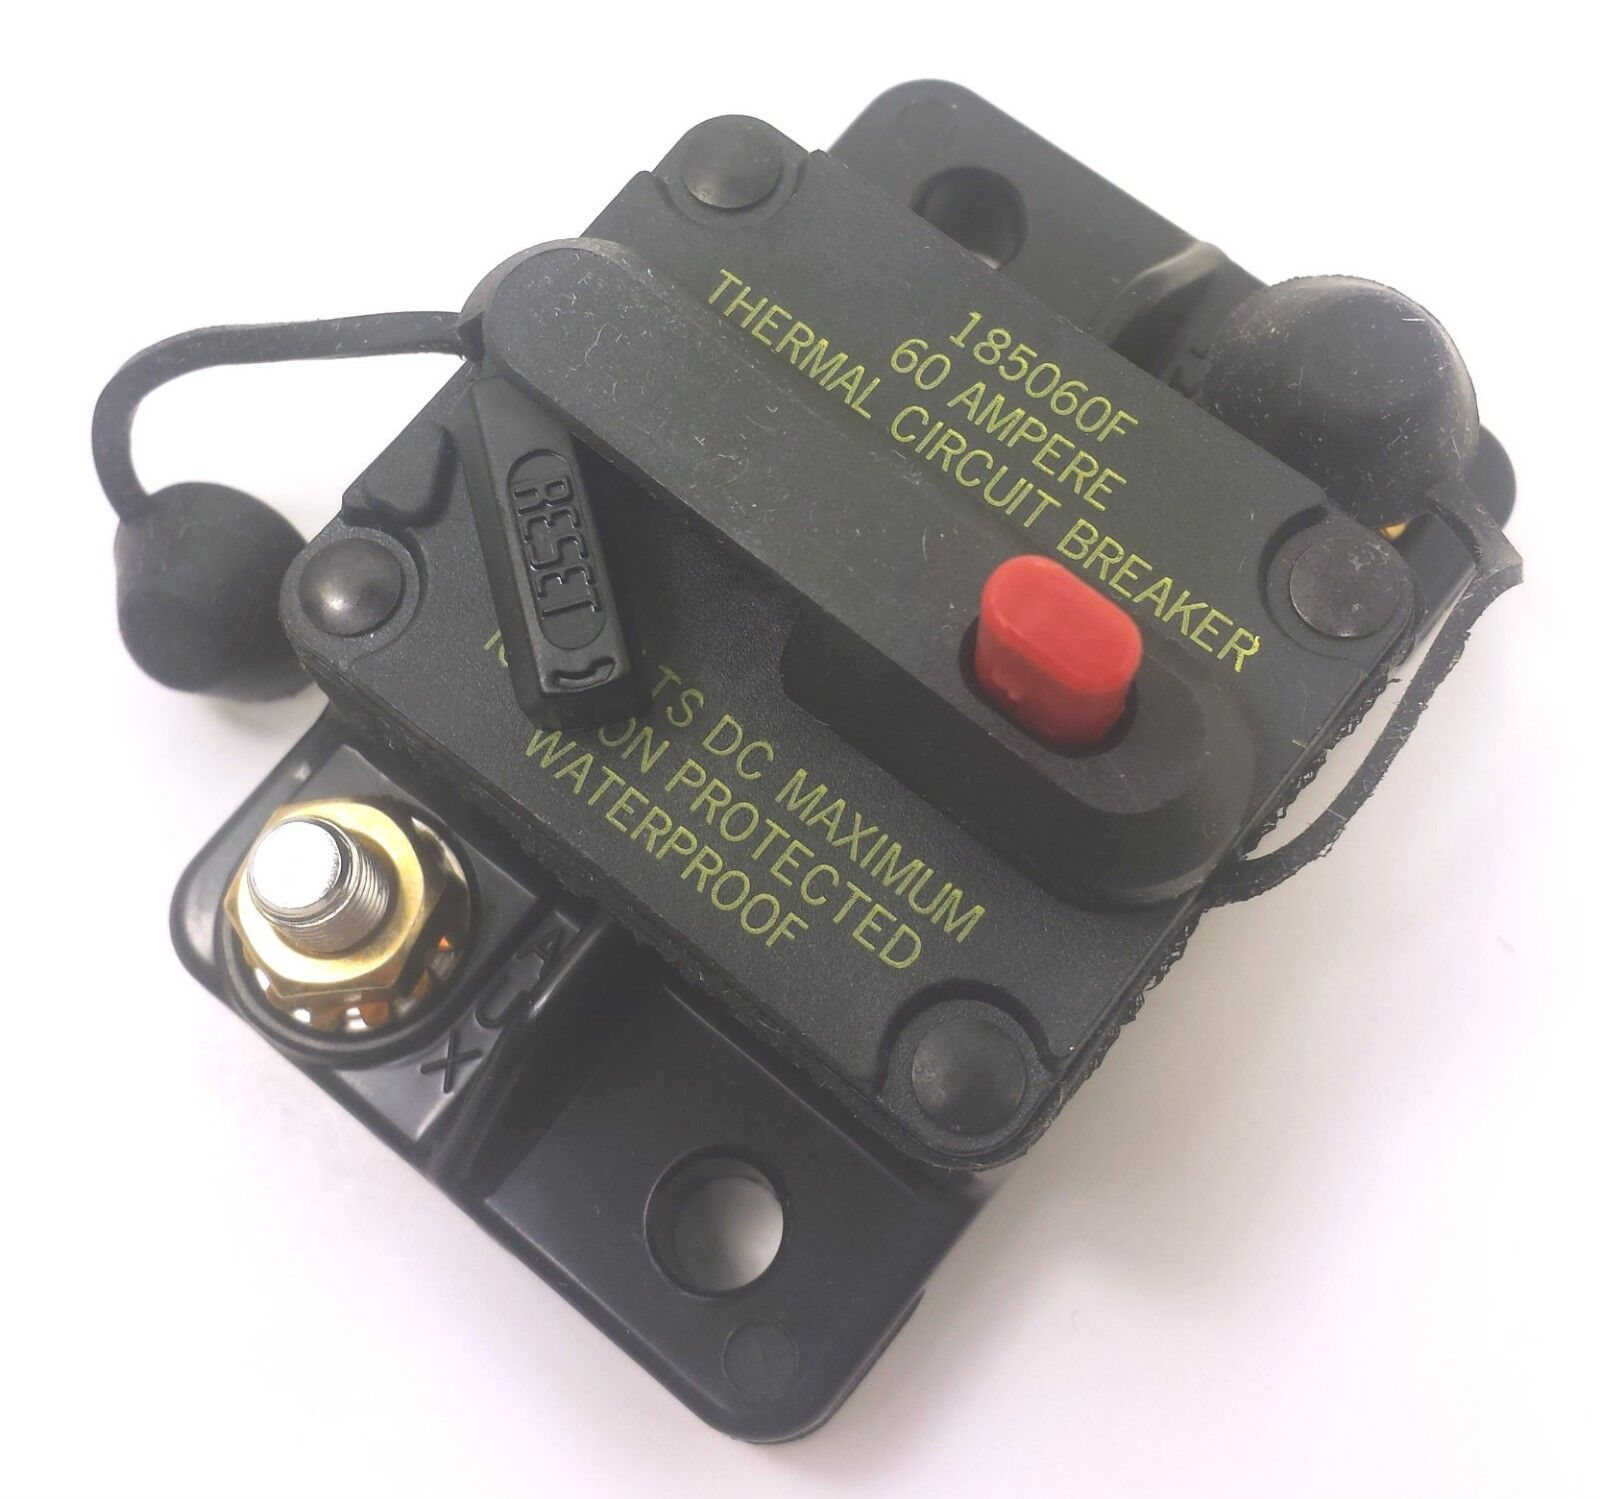 Auto Buss Circuit Breakers Optifuse Automotive Manual Reset Type Iii Bussmann Breaker Amp Surface Mount Waterproof 1600x1499